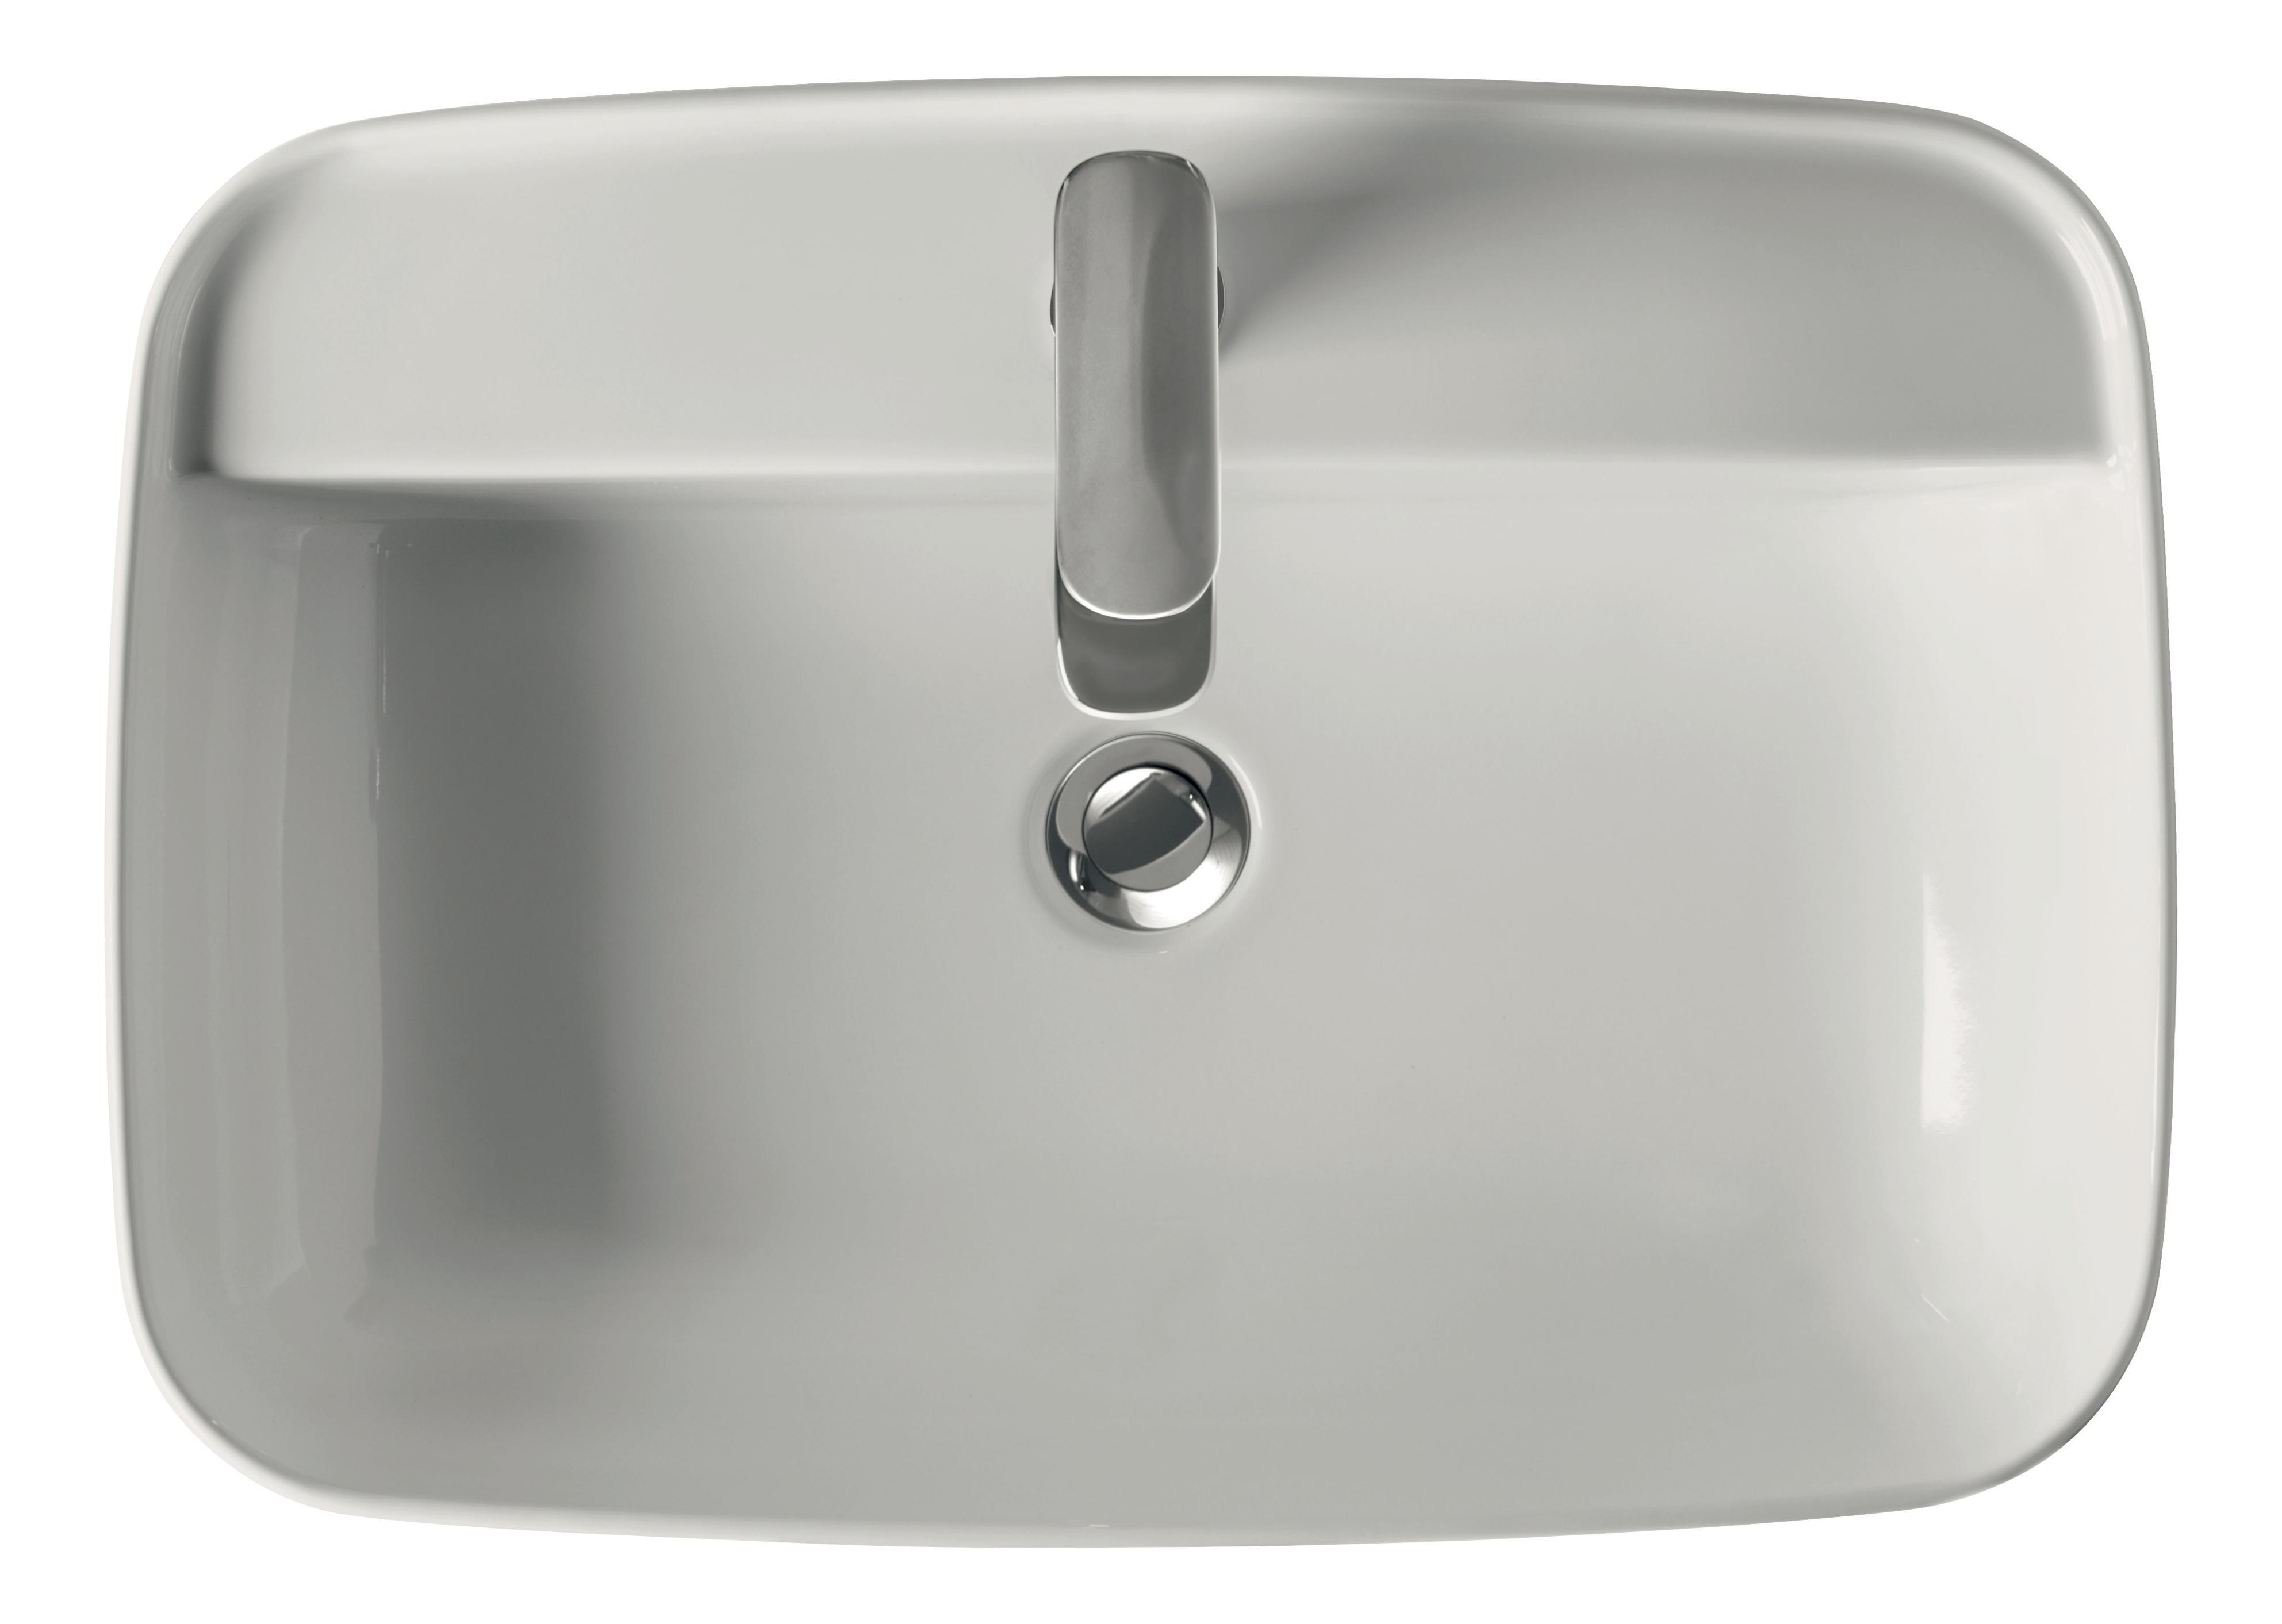 Vasca Da Bagno Kerasan : Vasca con piedini amazing vasca da bagno in stile retr con